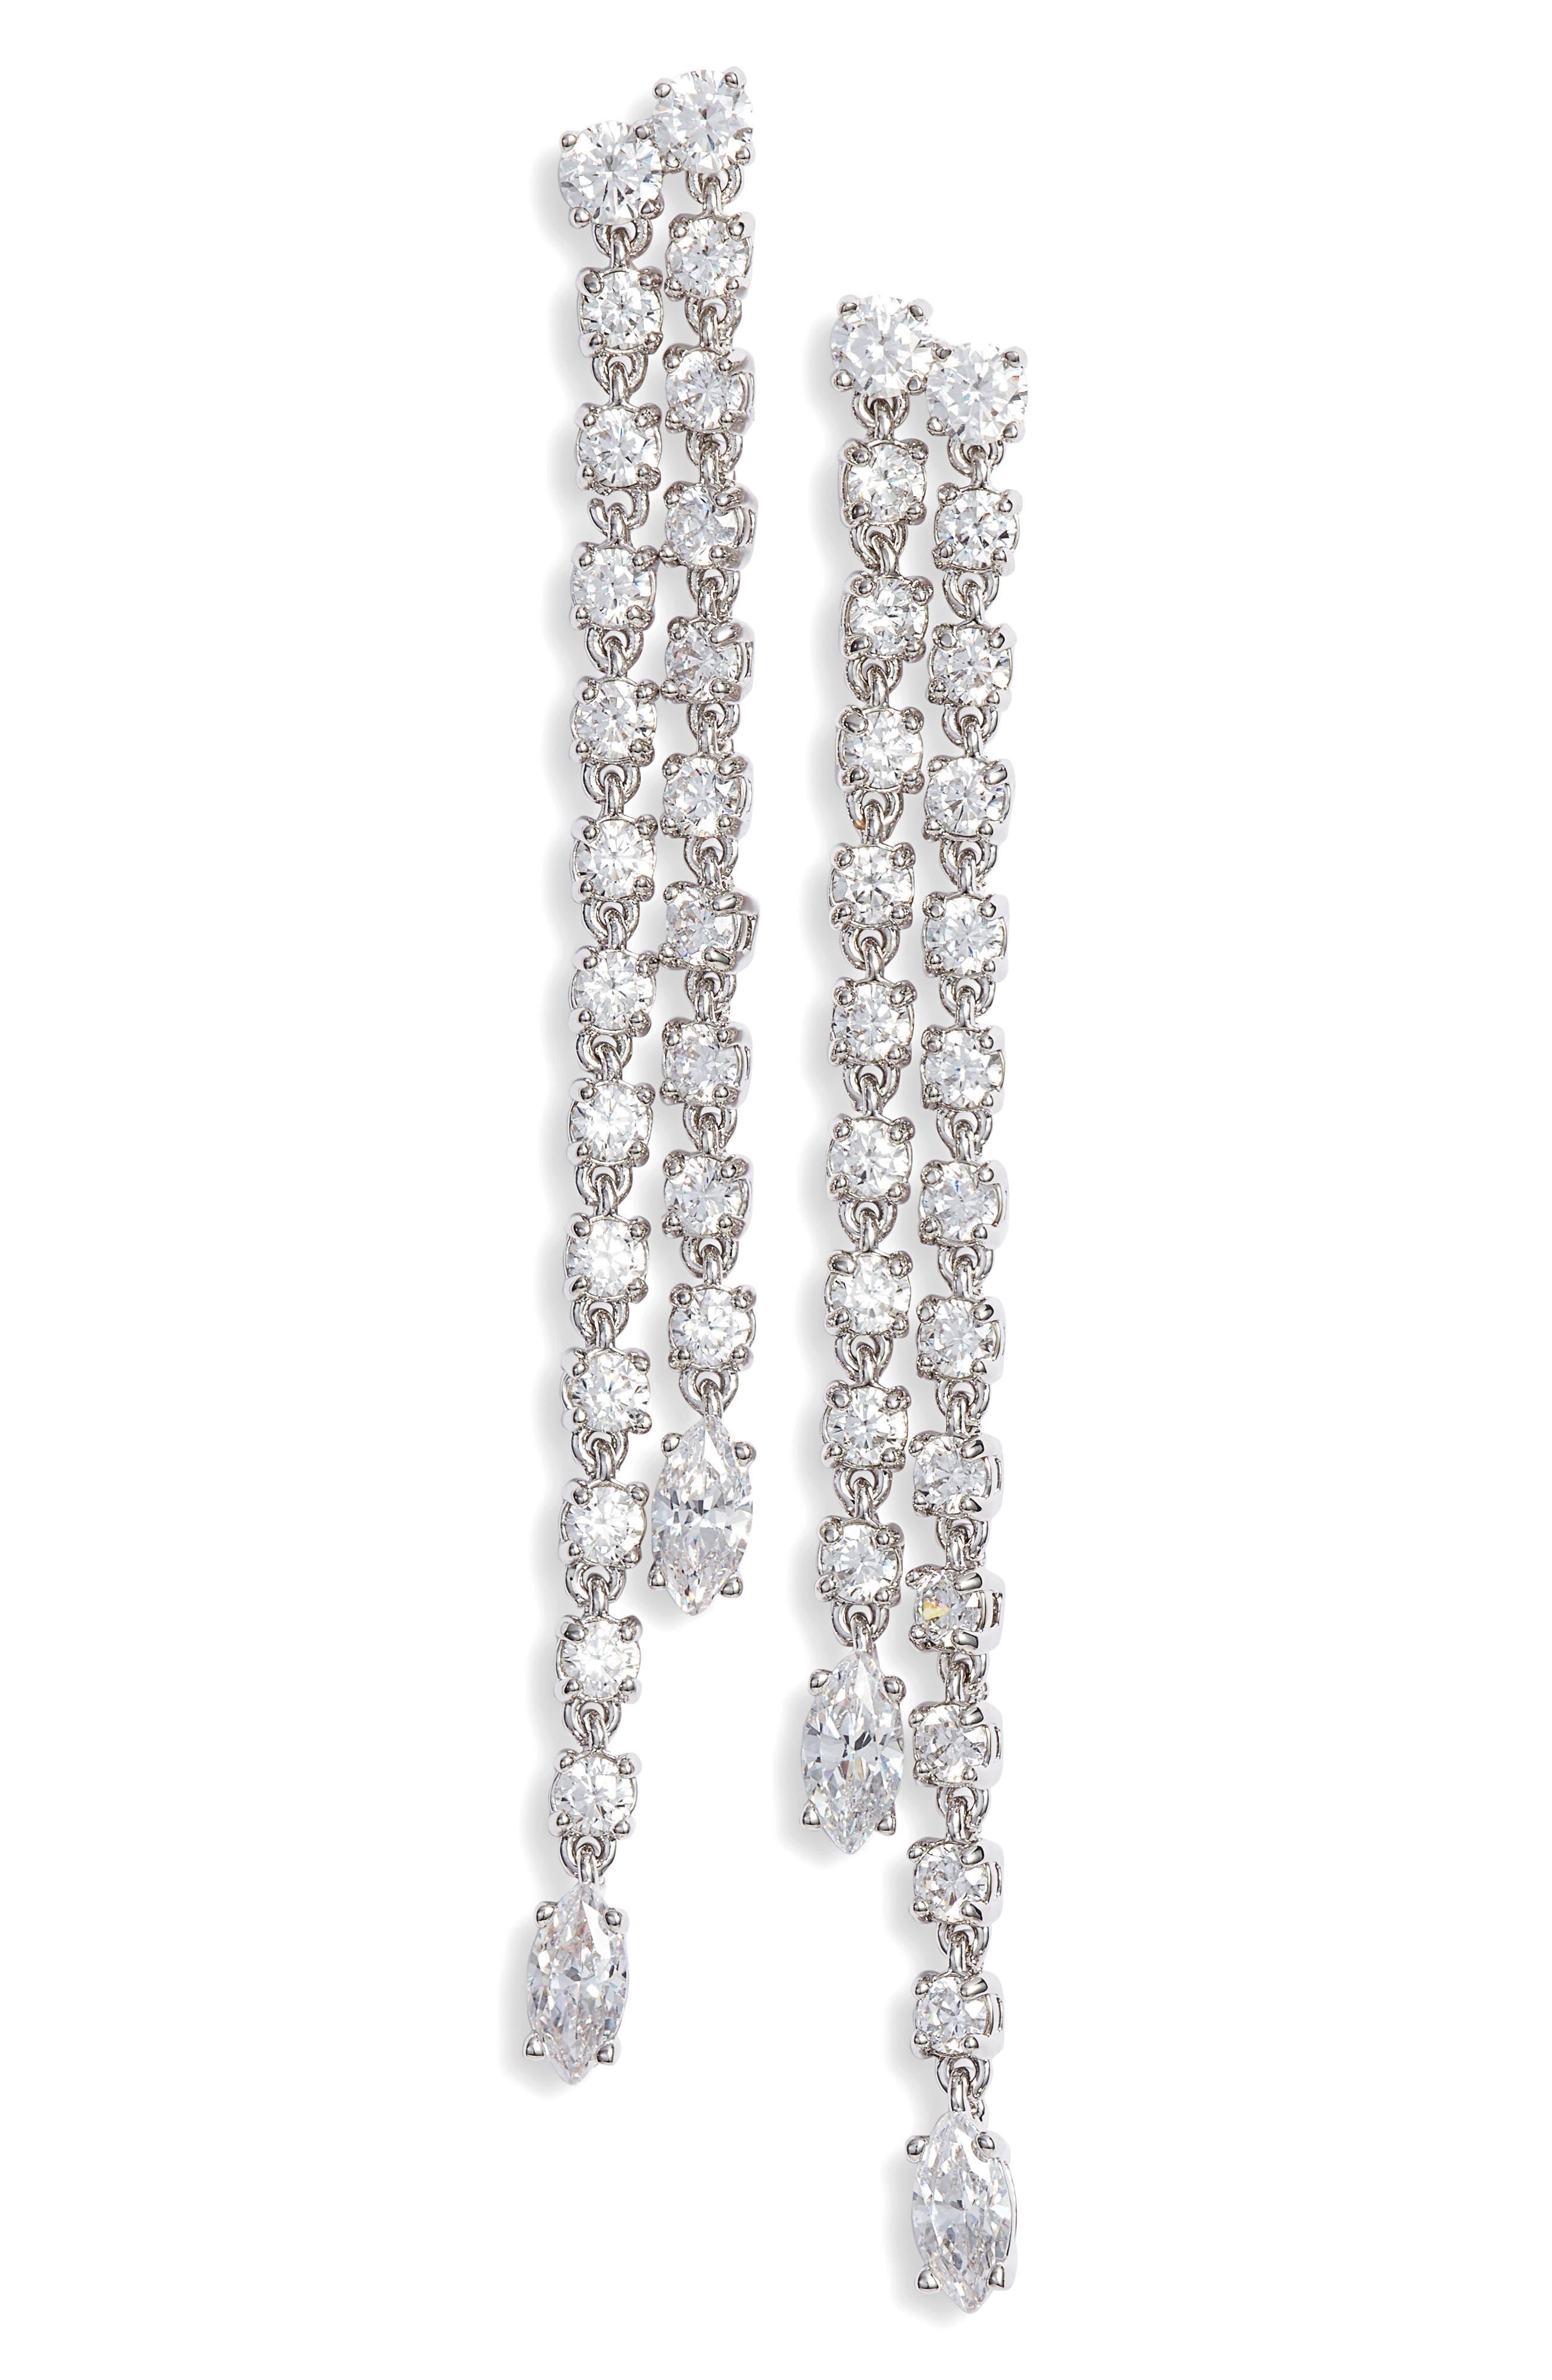 Linear Fringe Earrings,                             Main thumbnail 1, color,                             CLEAR- SILVER